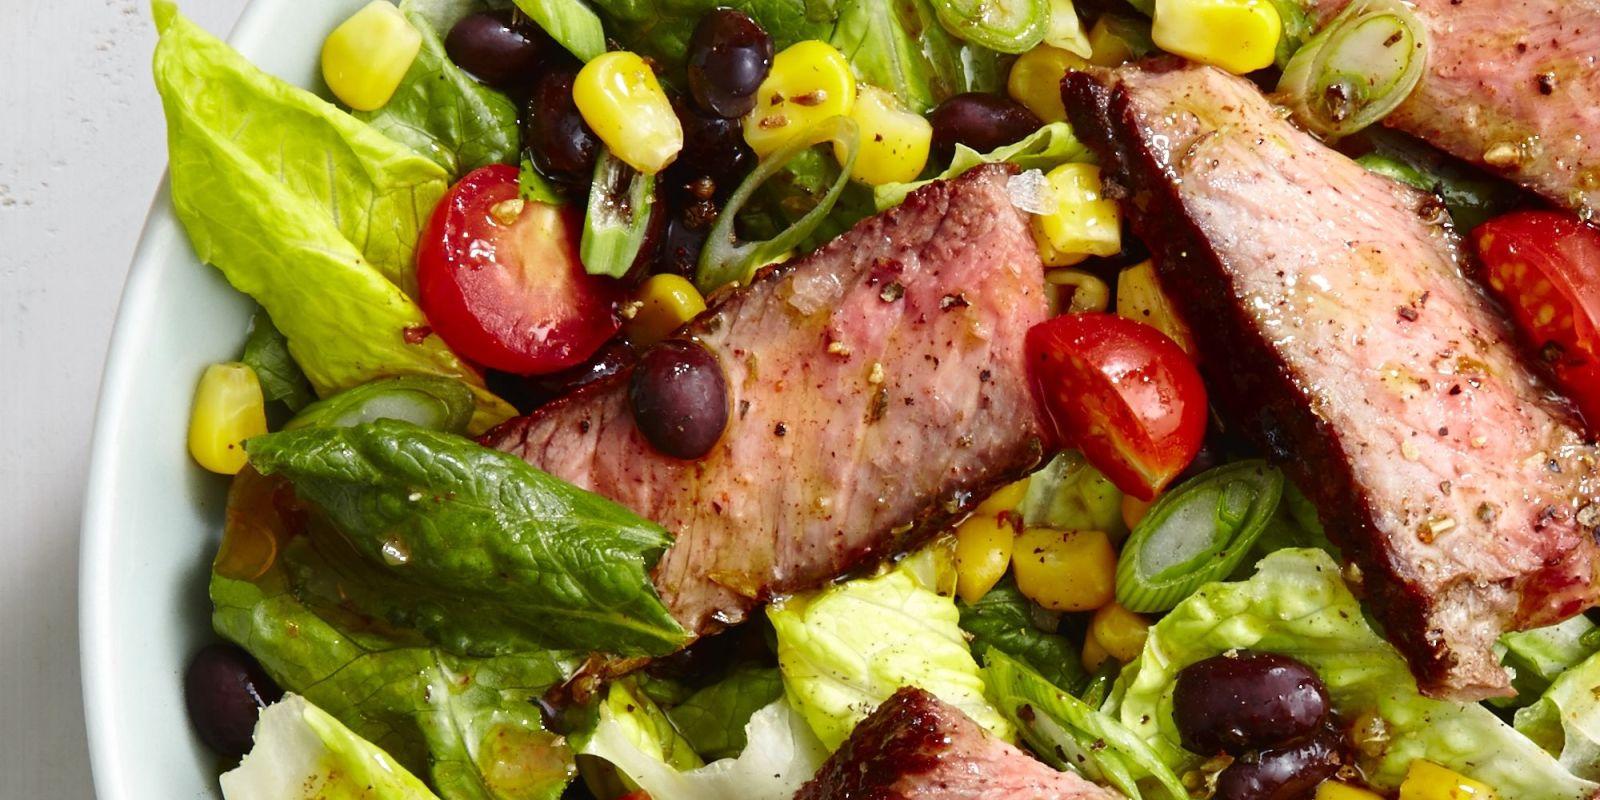 Best Steak Taco Salad Recipe - How to Make Steak Taco Salad